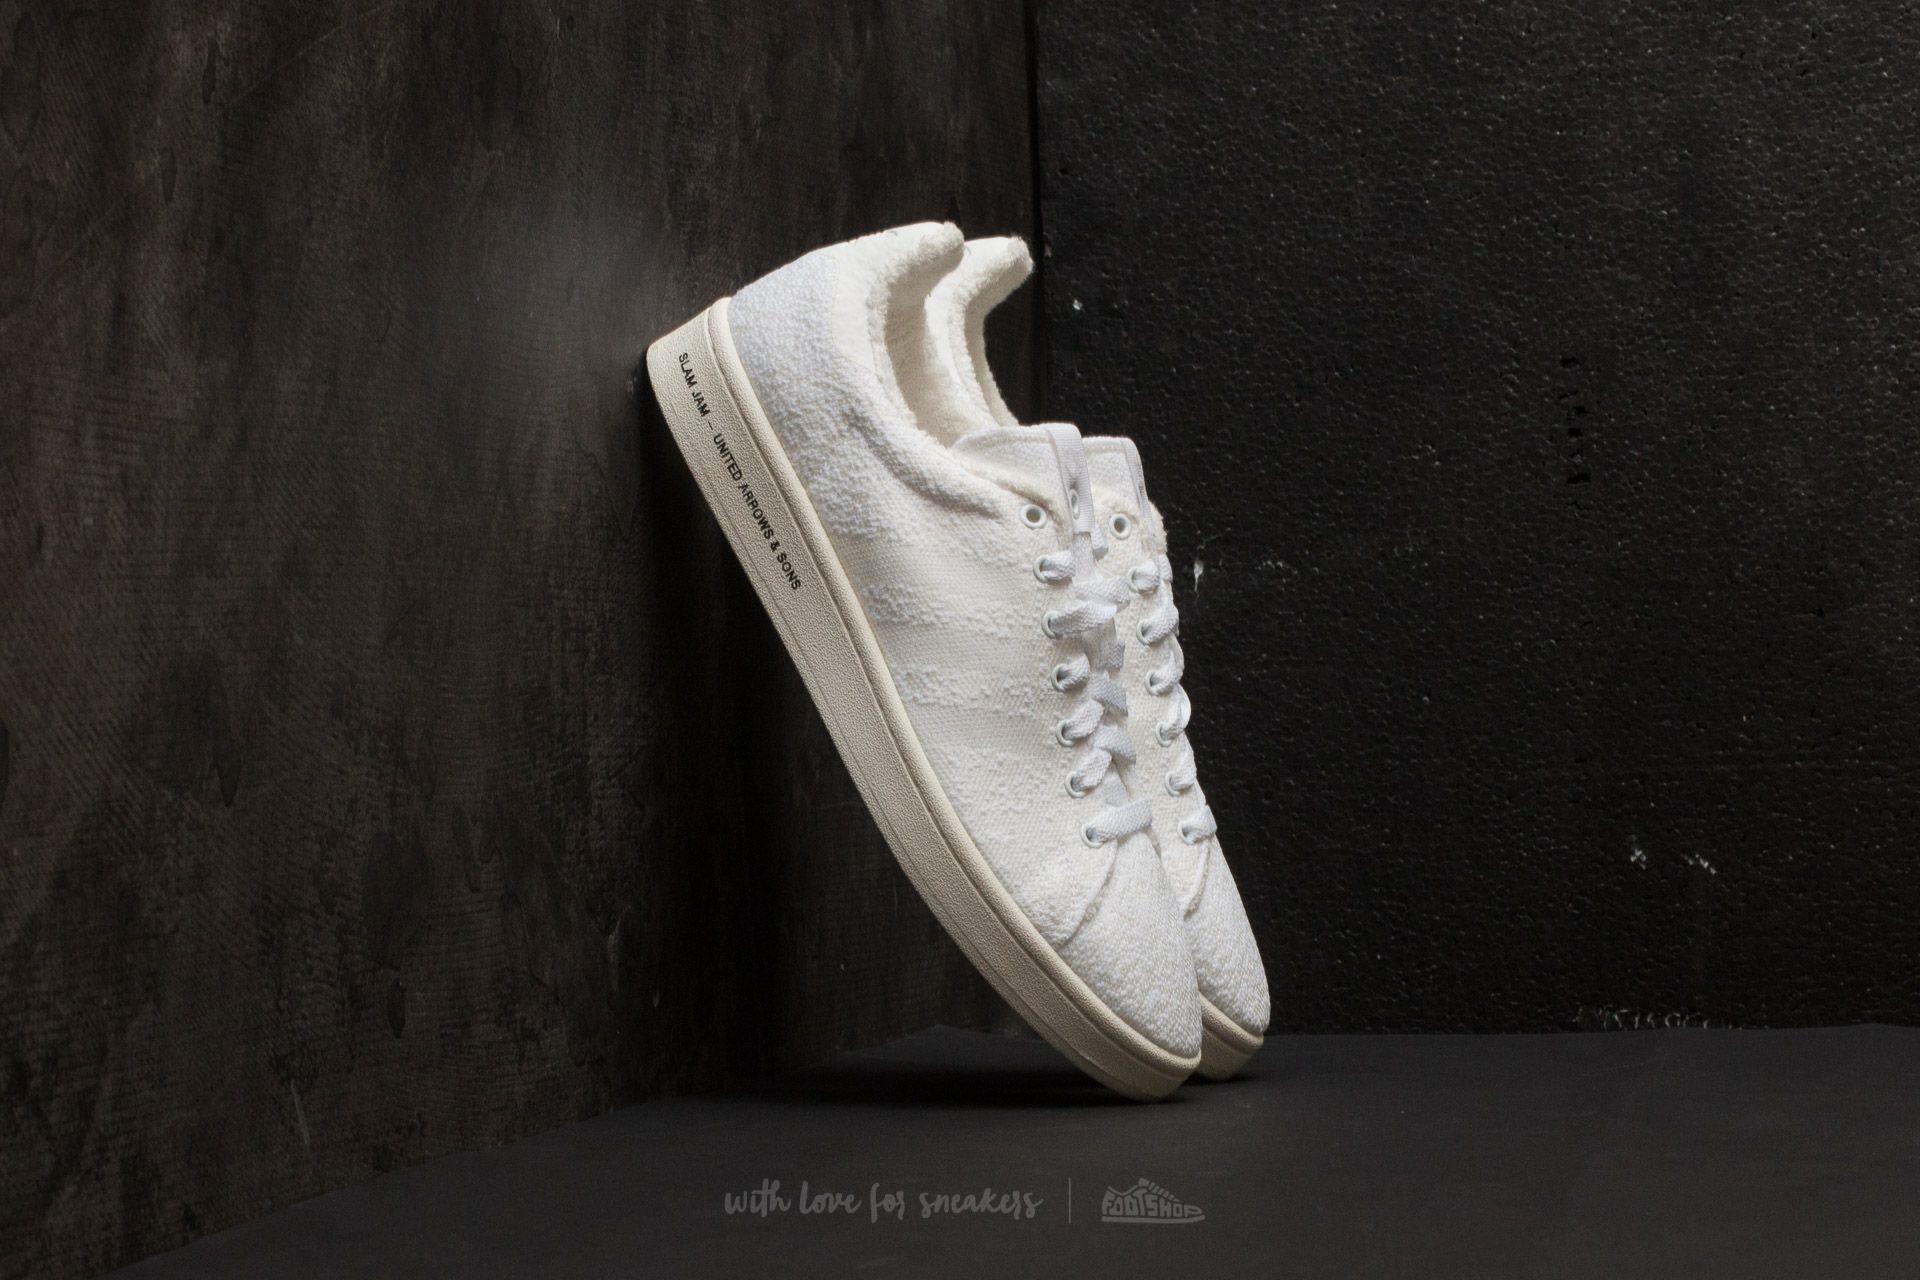 separation shoes 2ba7f fba25 adidas Consortium SE United Arrows amp Sons x Slam Jam Campus Footwear  White Footwear